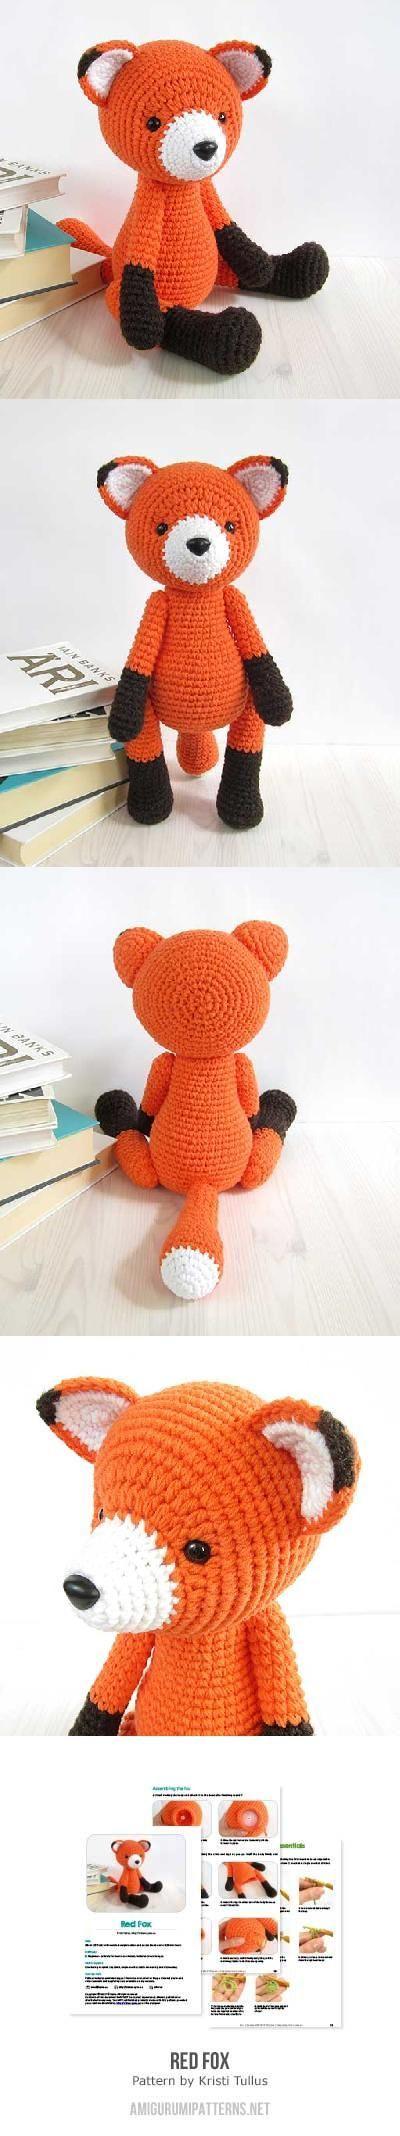 Red Fox amigurumi pattern by Kristi Tullus | Pinterest | Fuchs, Süß ...